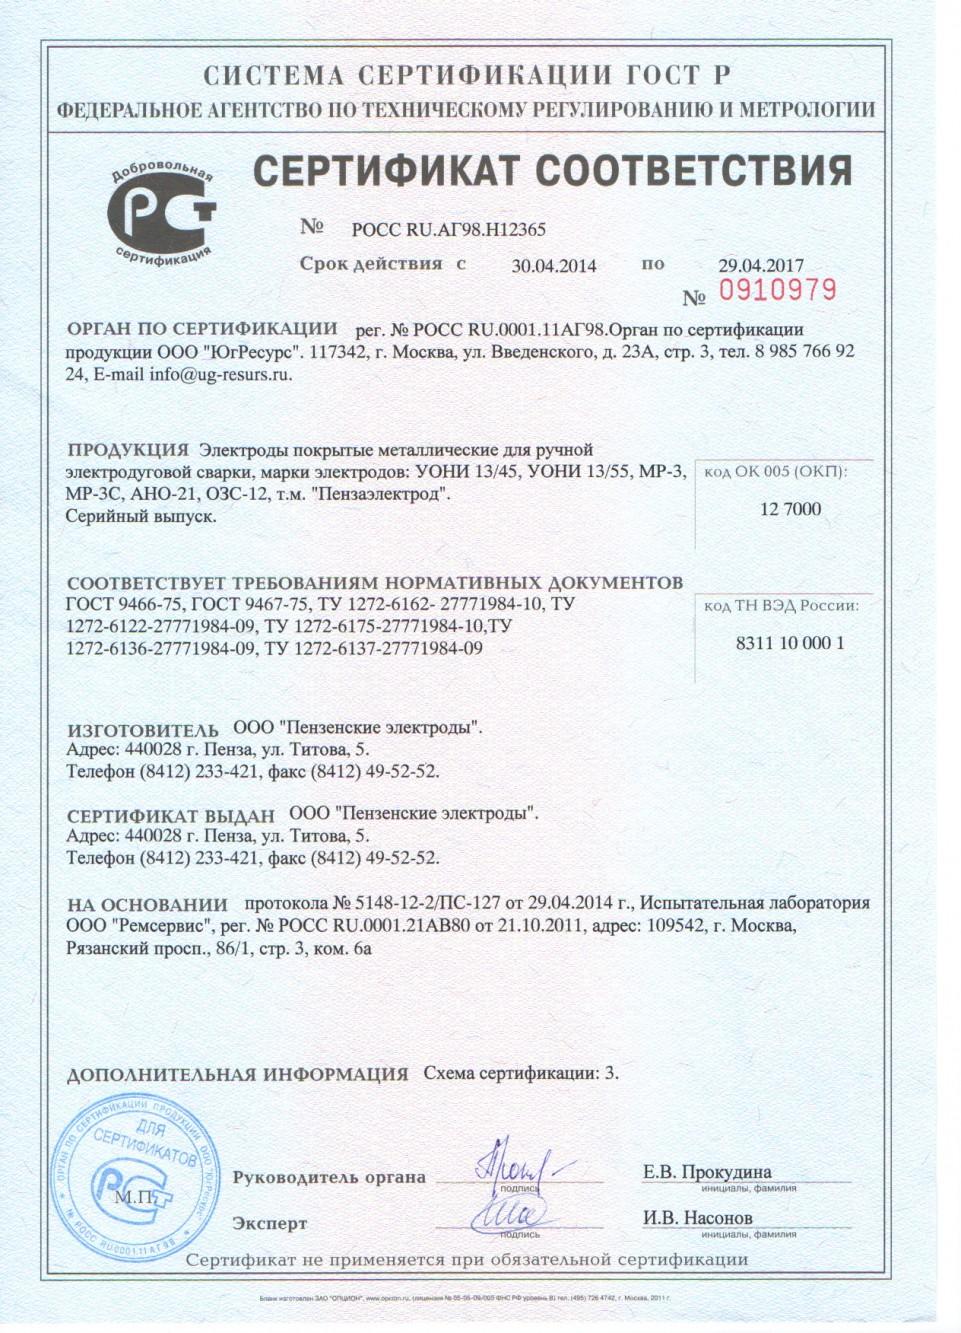 Сварочные электроды уони-13/55 гост 9466 э50а, цена 351 тг.